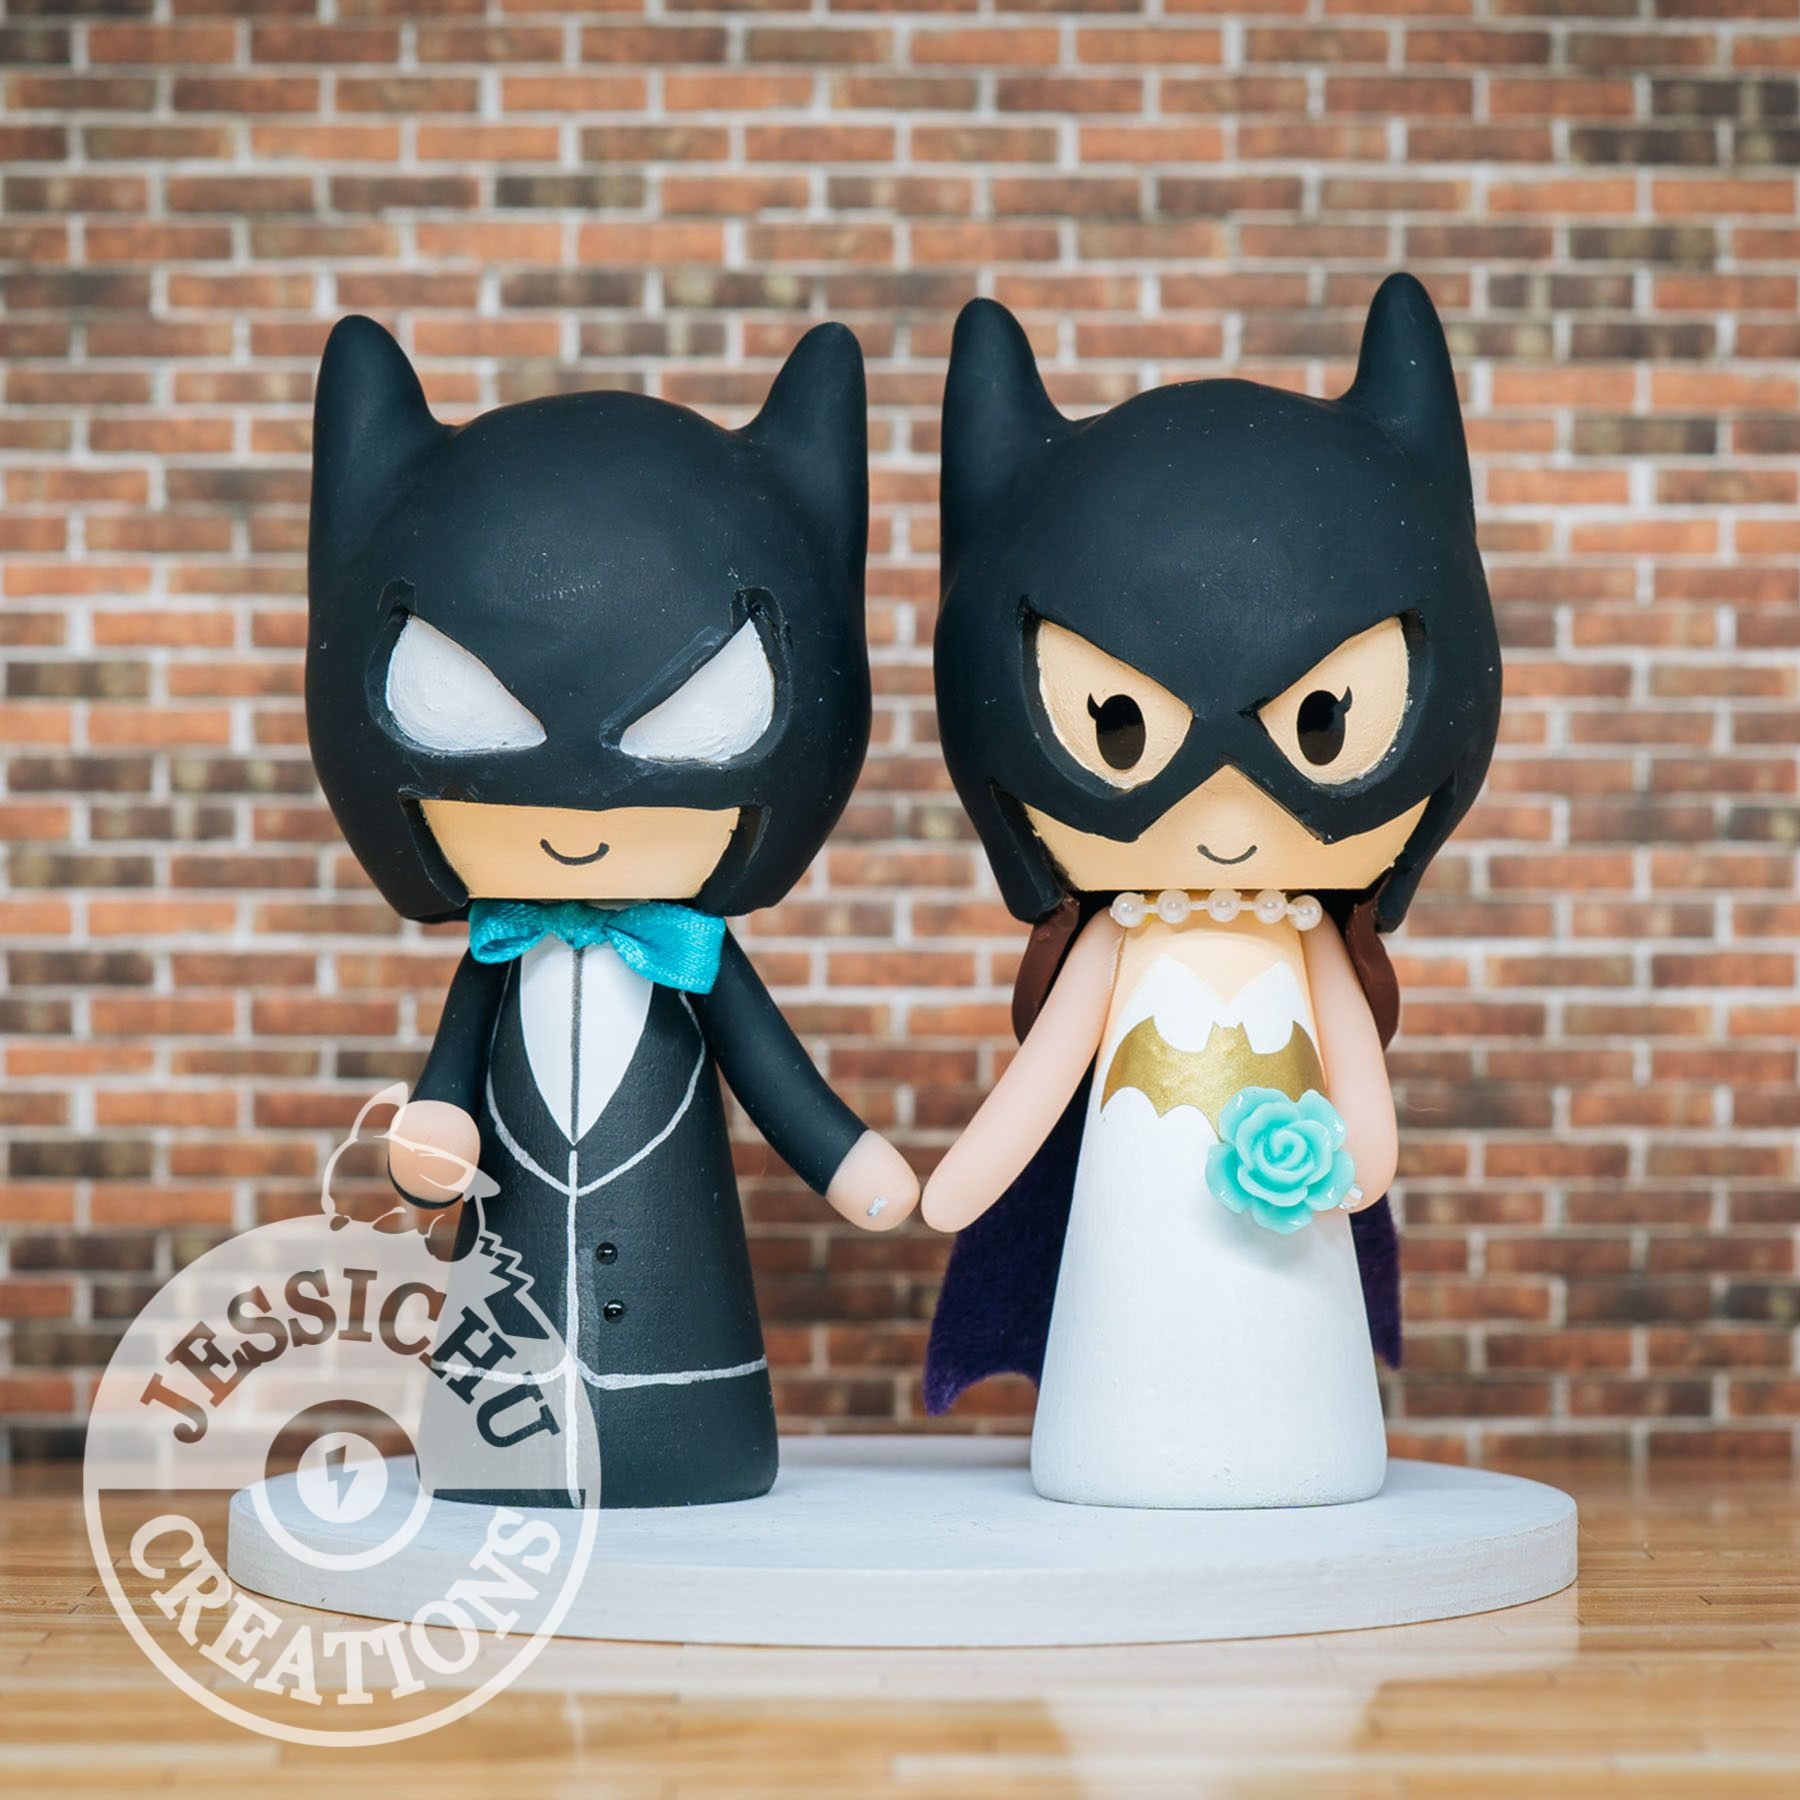 Batman Groom And Batgirl Bride Inspired Dc Comics Custom Made Figurine Wedding Cake Topper Wedding Cake Topper Figurines Batman Wedding Batman Wedding Cakes